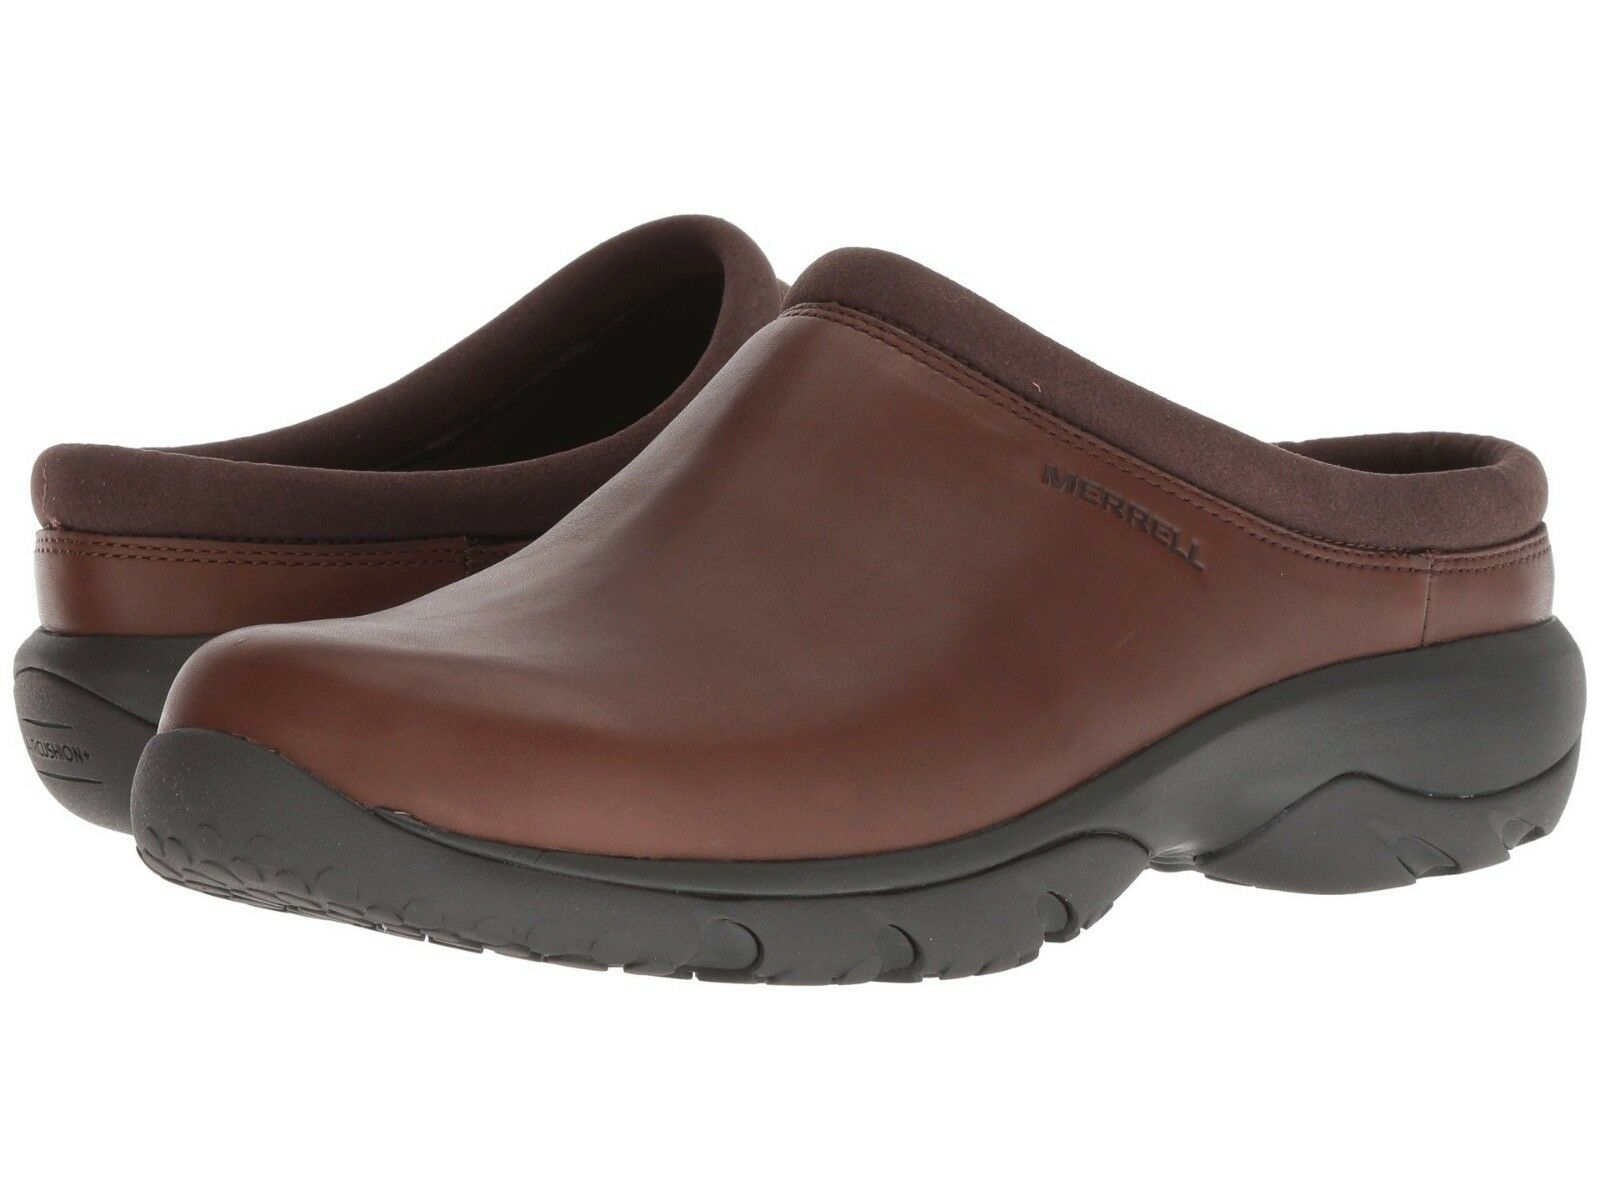 NEW Mens Merrell Encore Rexton Slide AC+ Earth Marroneee Leather Slip On scarpe